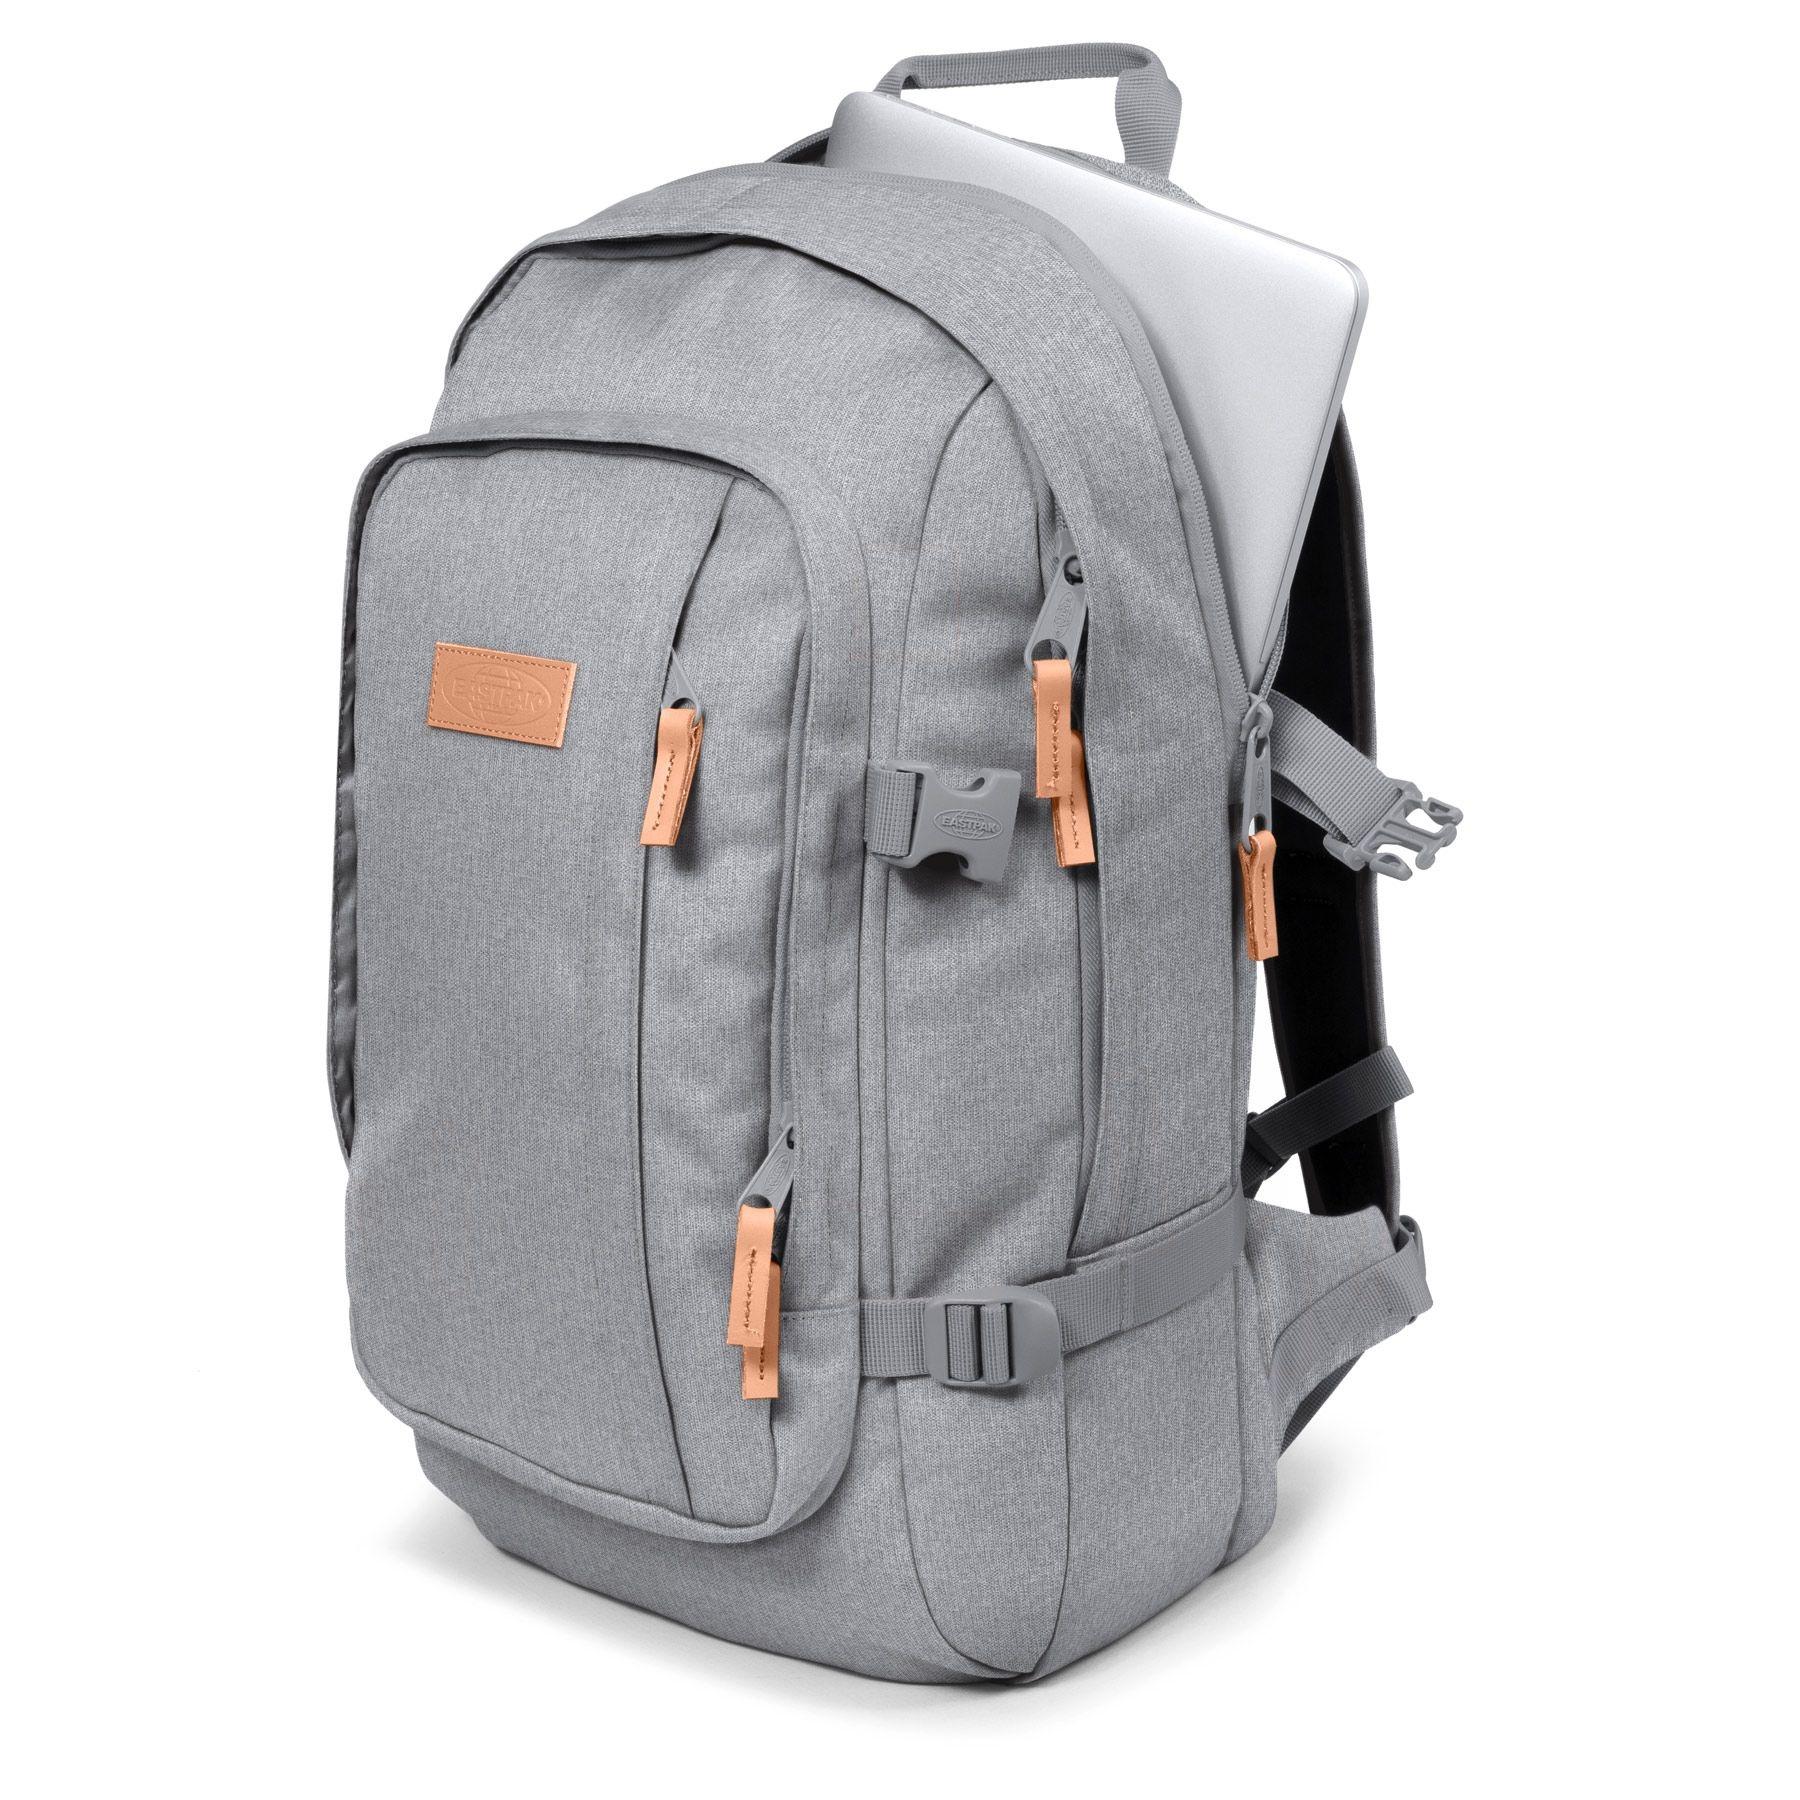 Eastpak Eastpak Evanz  Sunday Grey 15 - 17 inch laptoprugtas